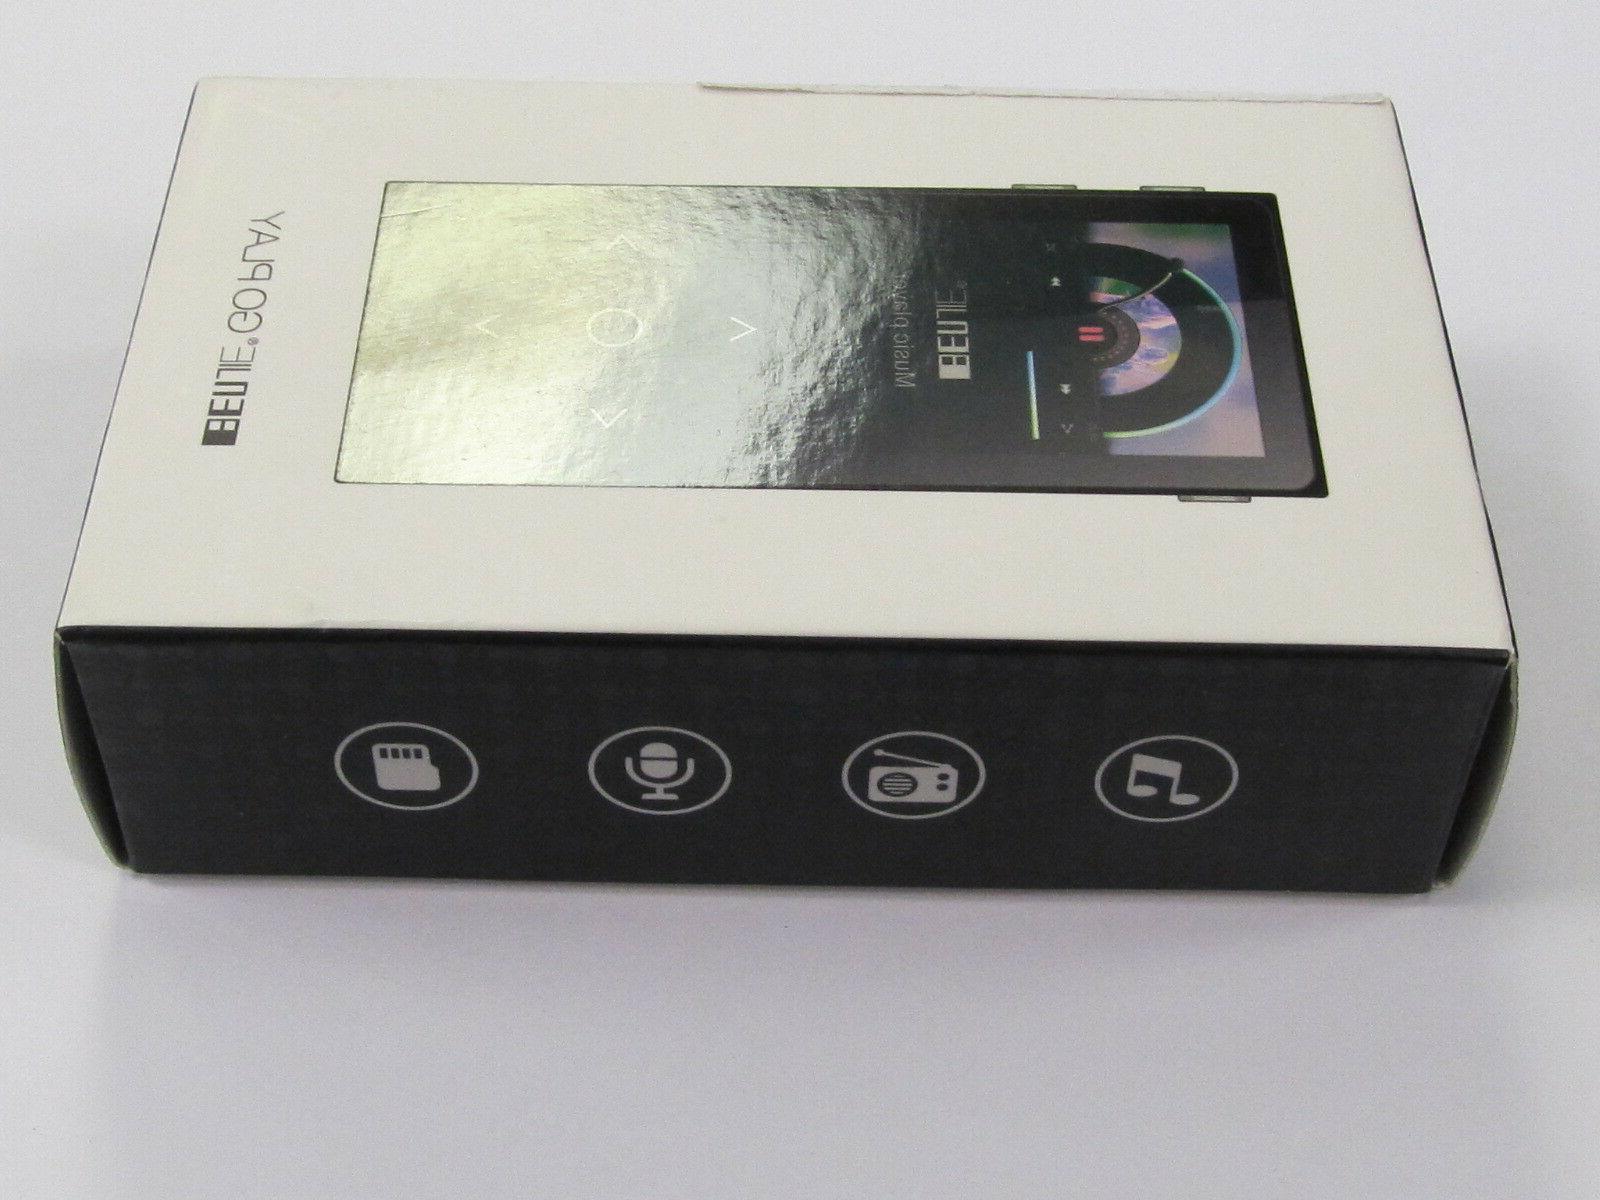 Benjie GoPlay K9B 8GB MP3 Music Player NEW - NICE! SHIPPING! L@@K